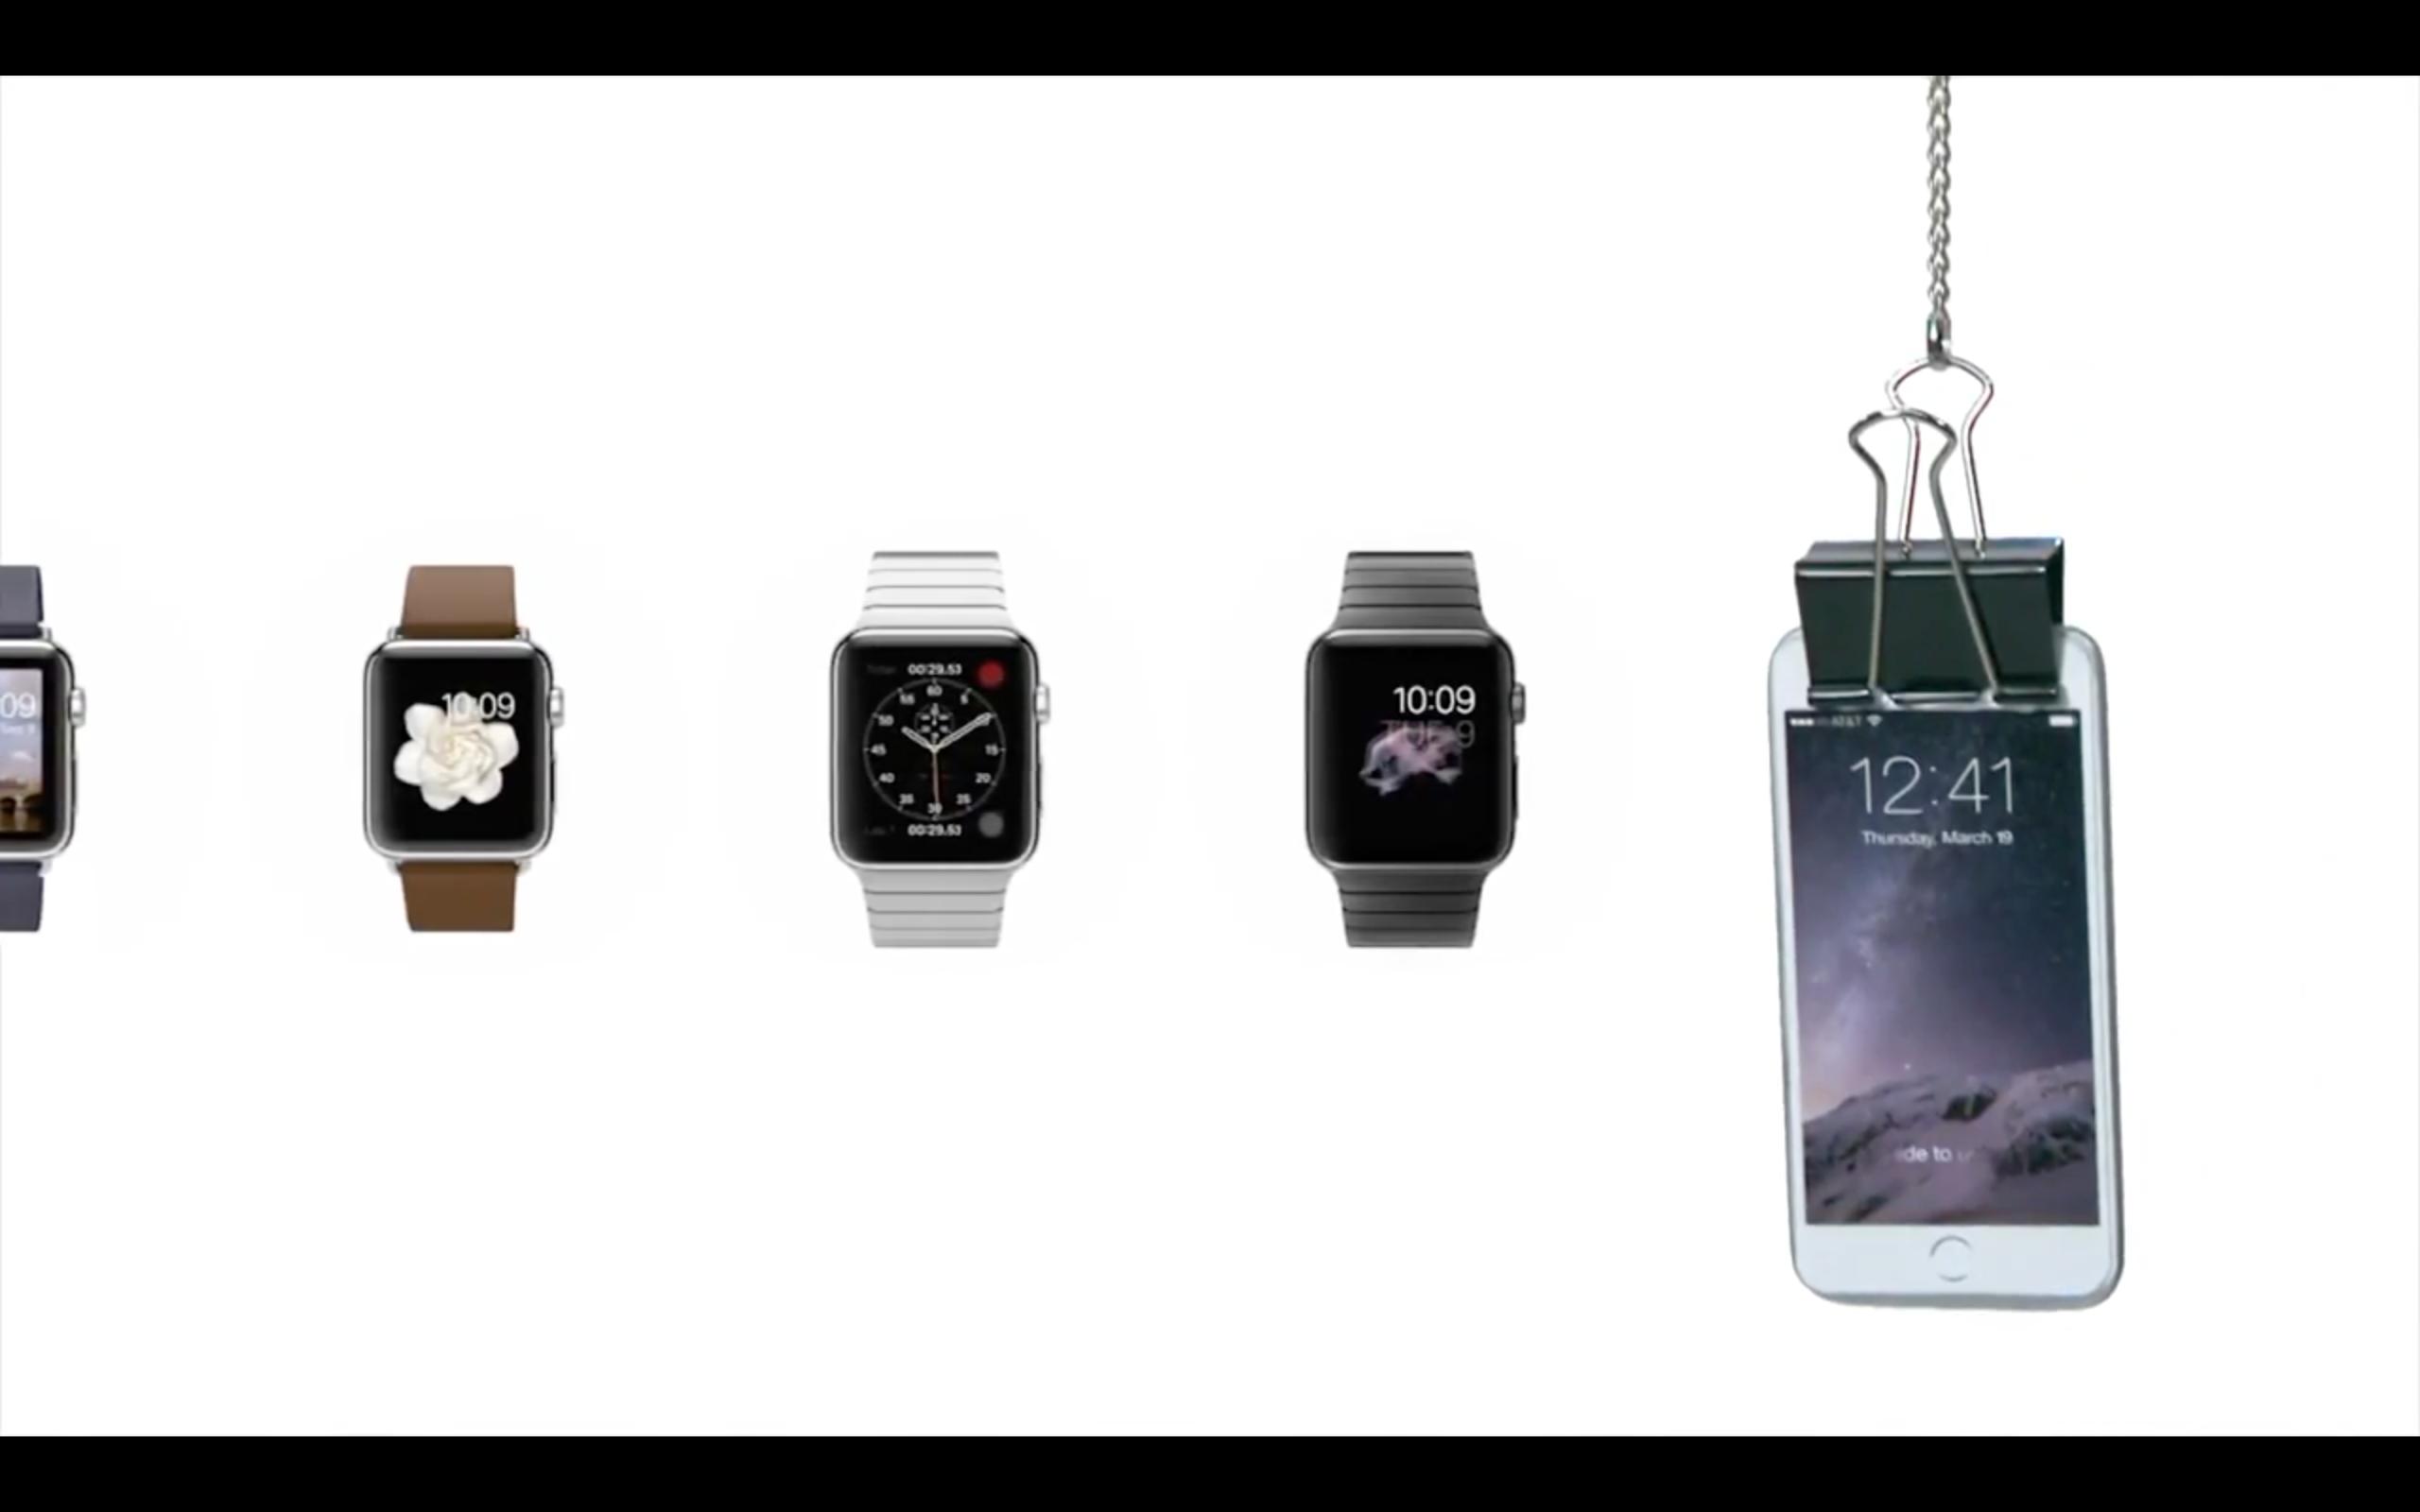 Apple Watch Pocket humor1